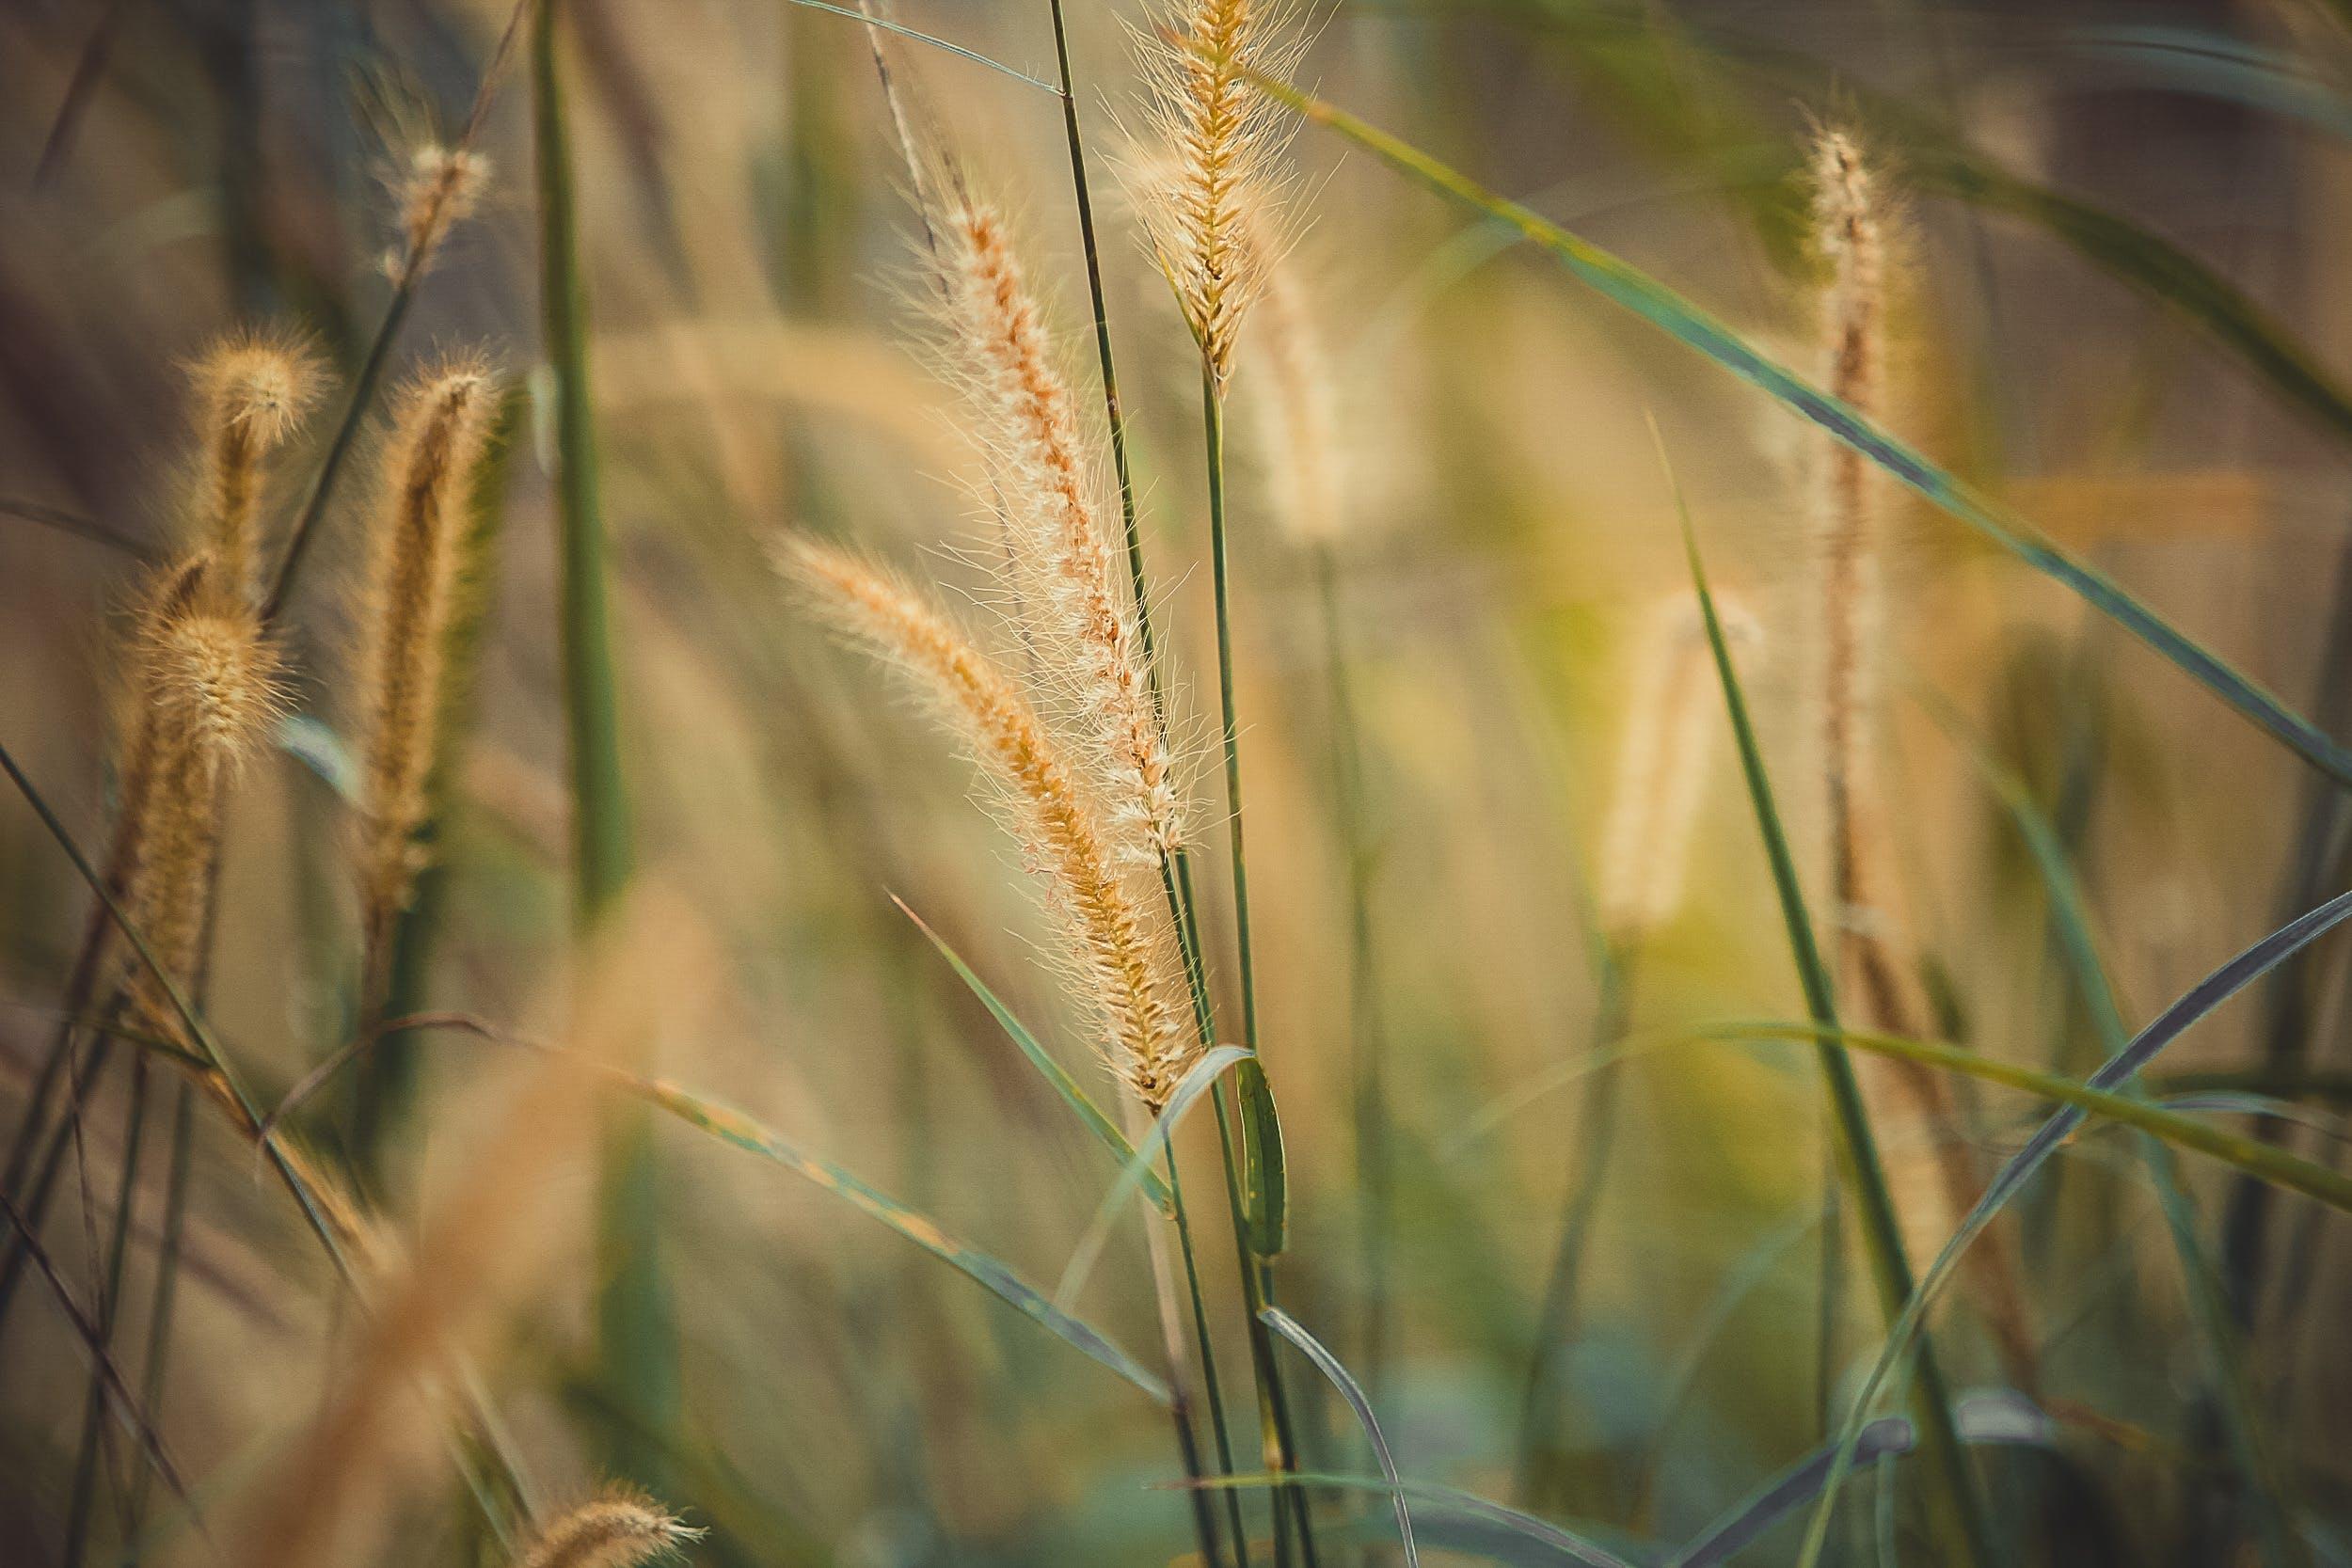 Close Up Photo of Wheat